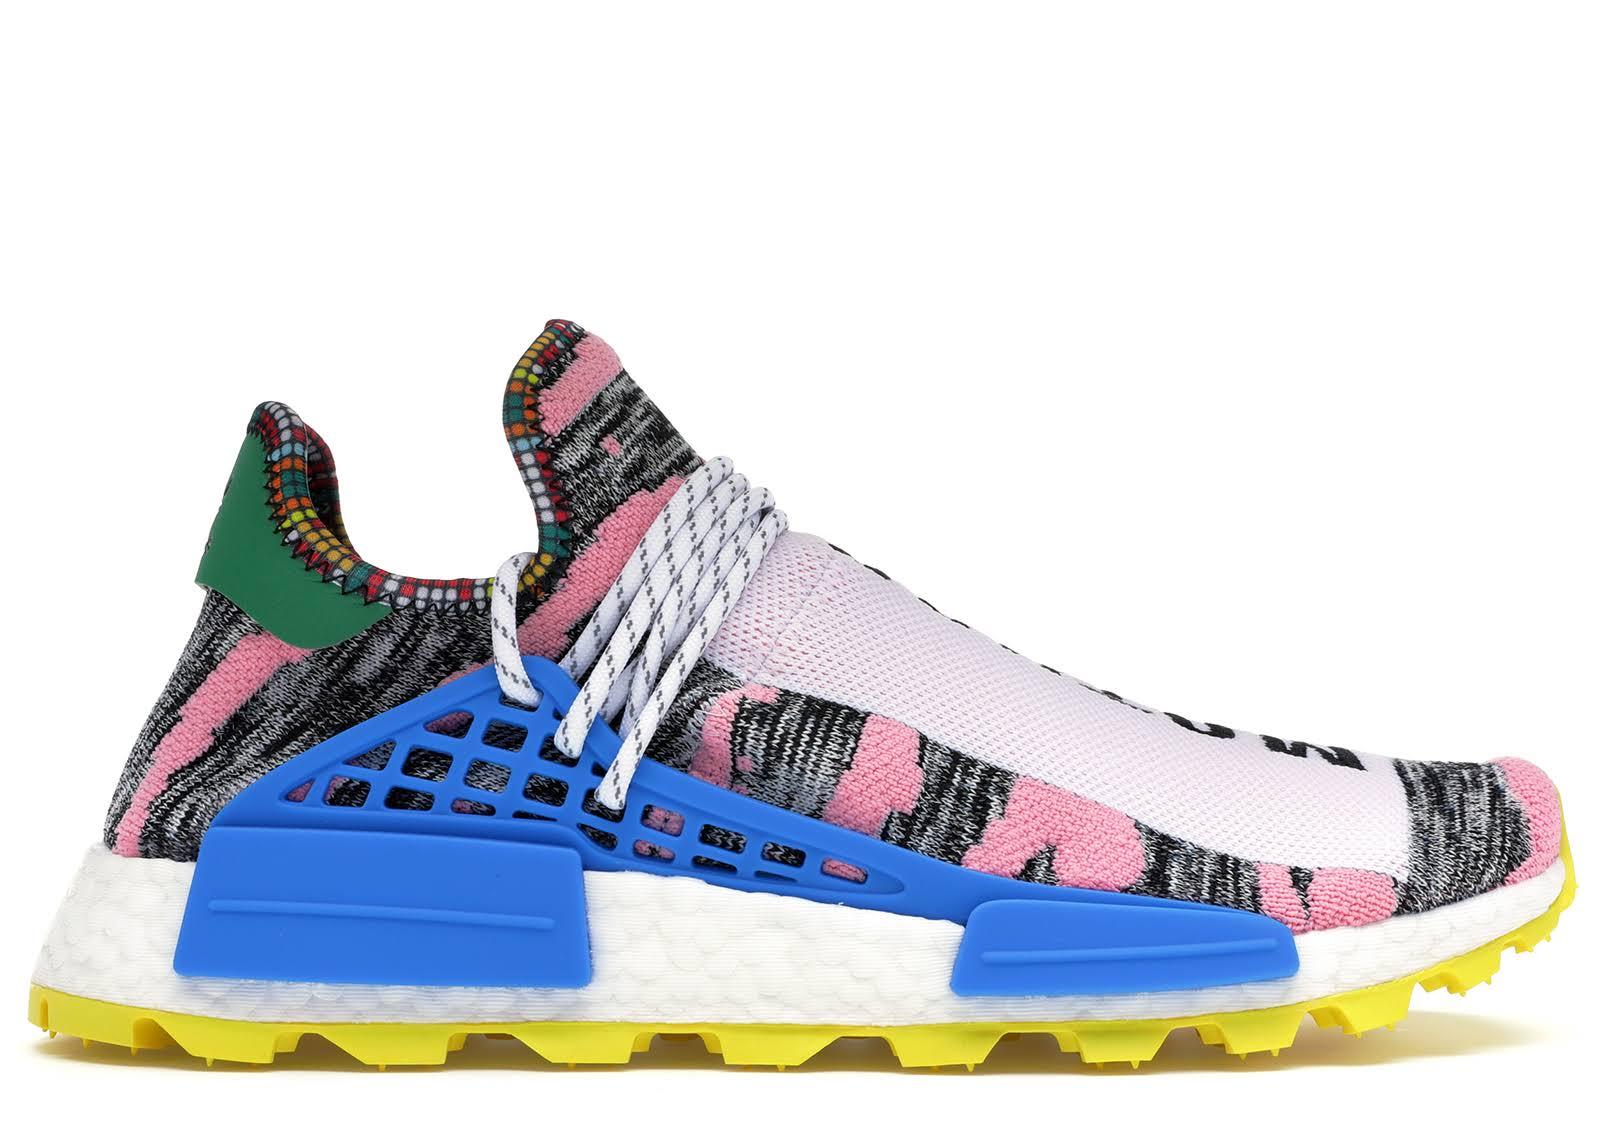 Adidas Solar' X 'paquete Pharrell Originals Nmd Hombre Para Zapato Casual rxXwvrq